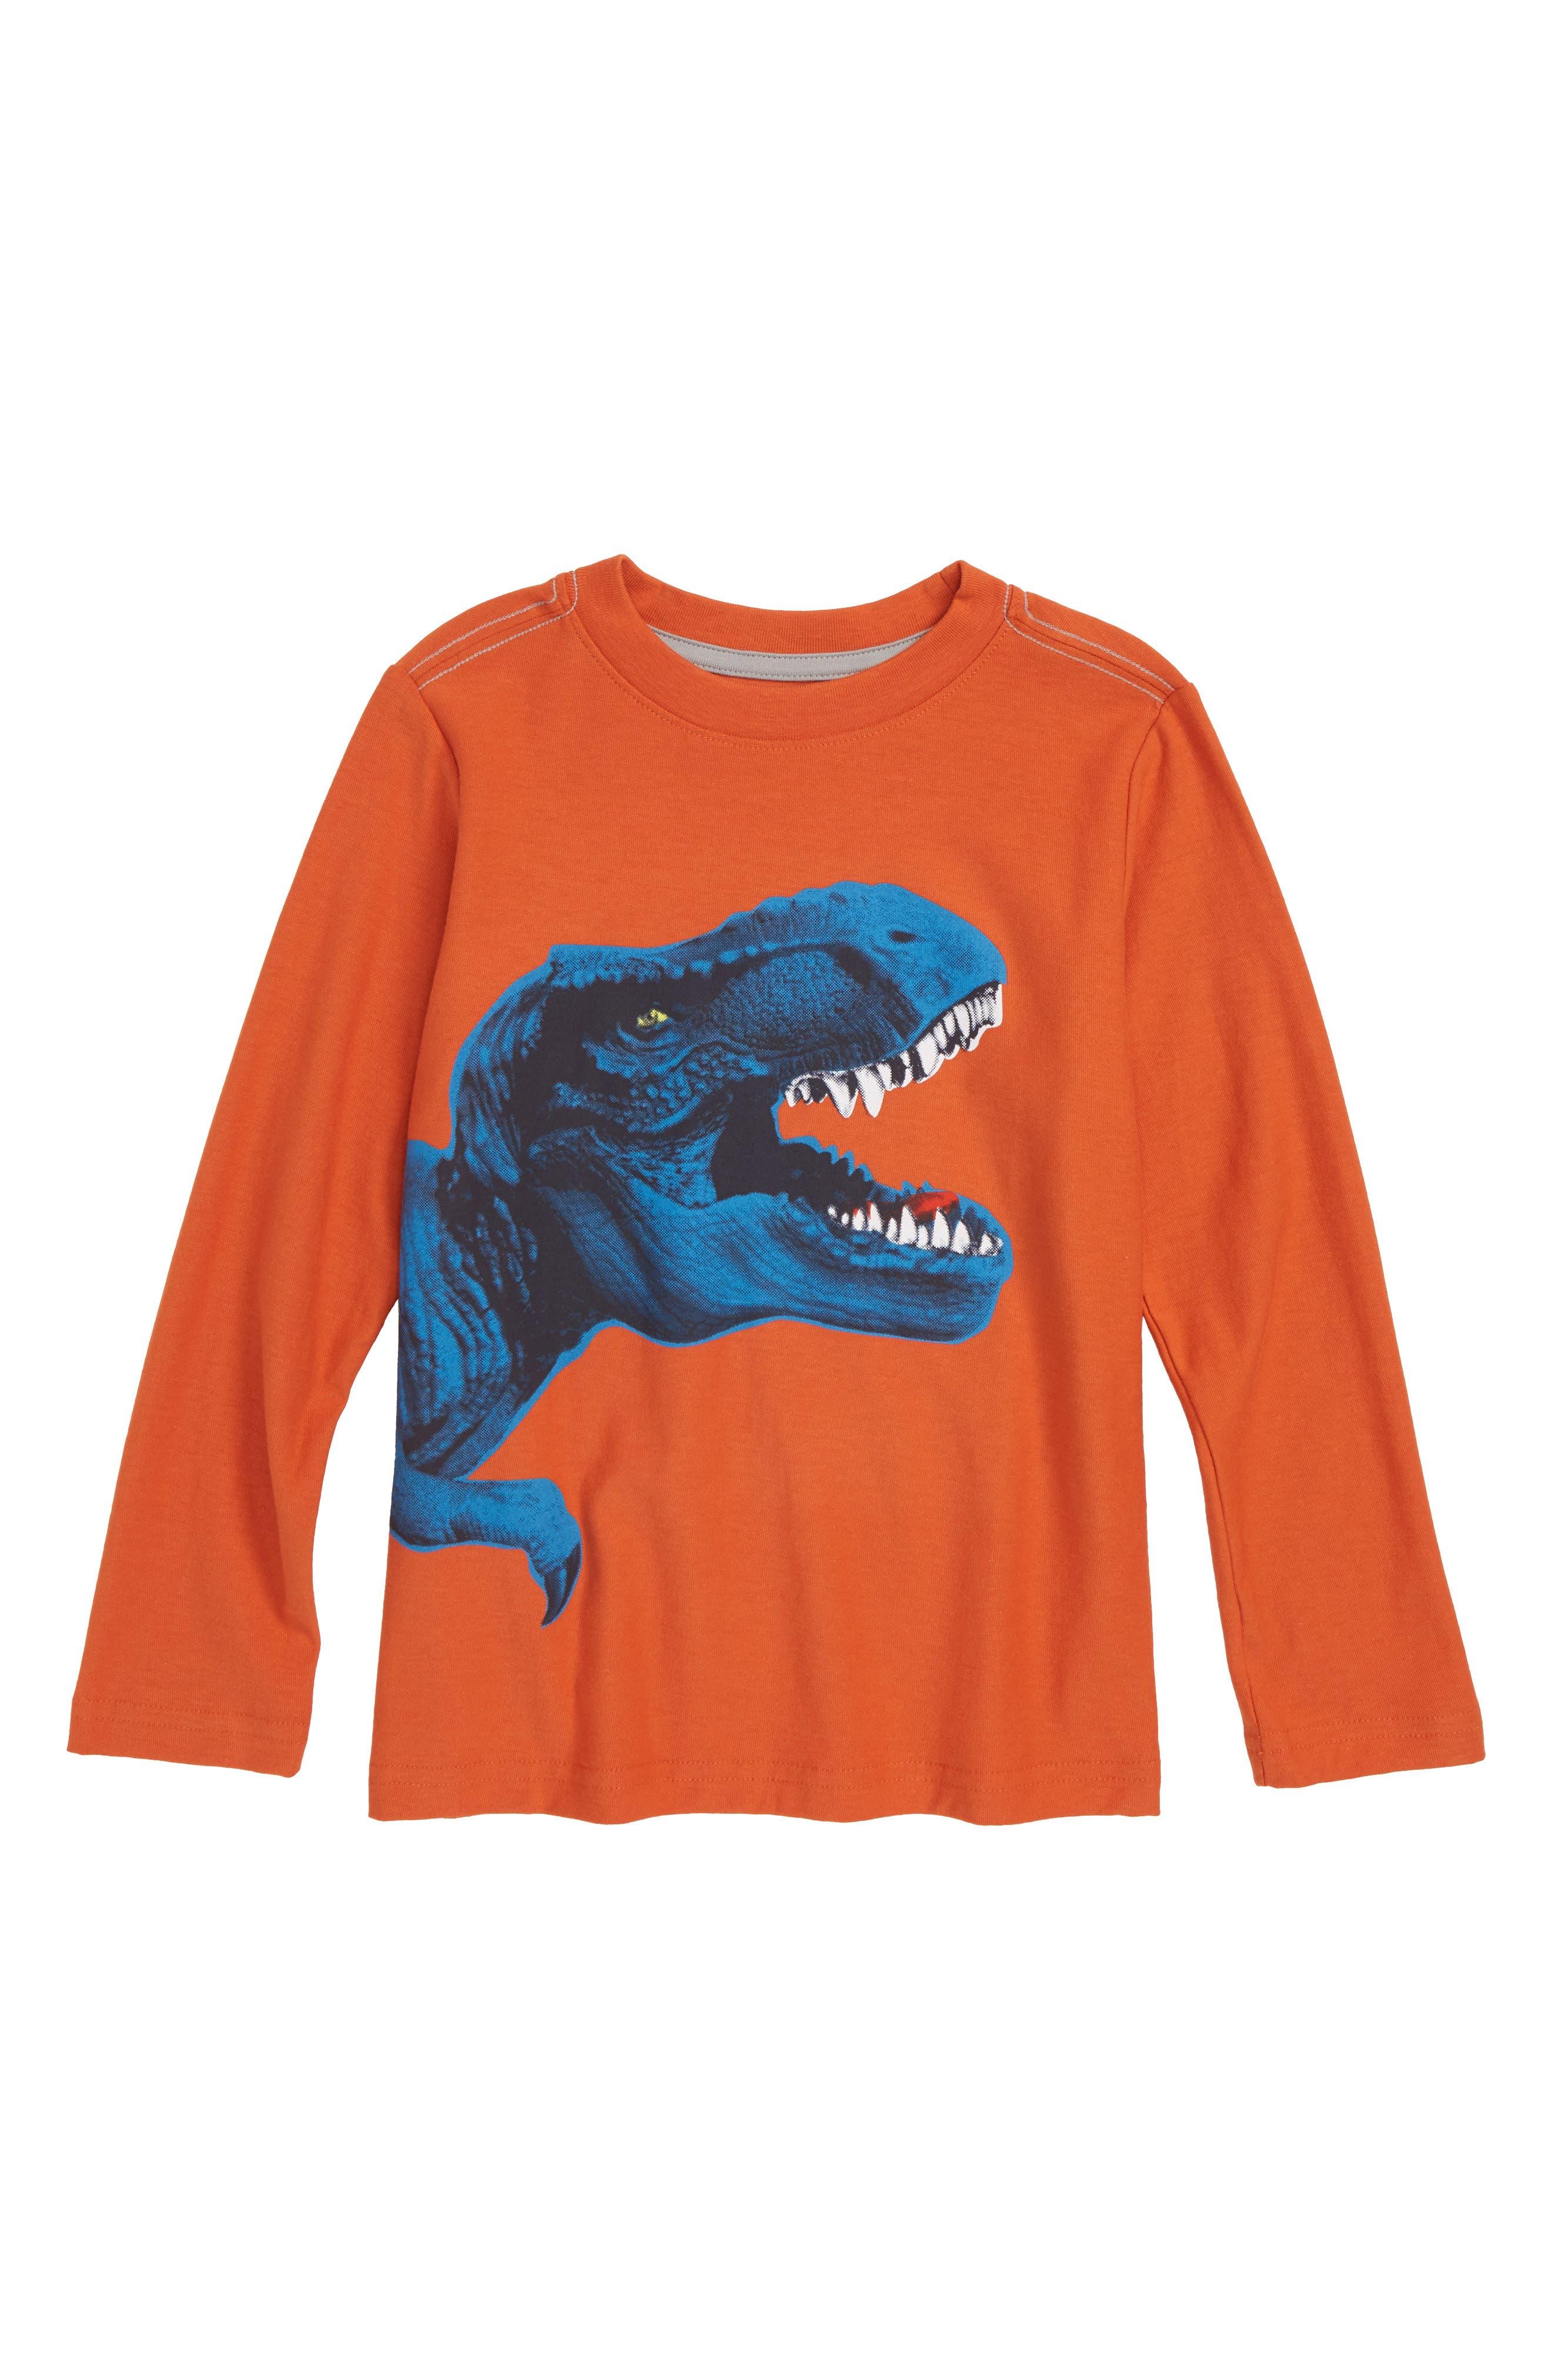 T-Rex T-Shirt,                             Main thumbnail 1, color,                             TERRA